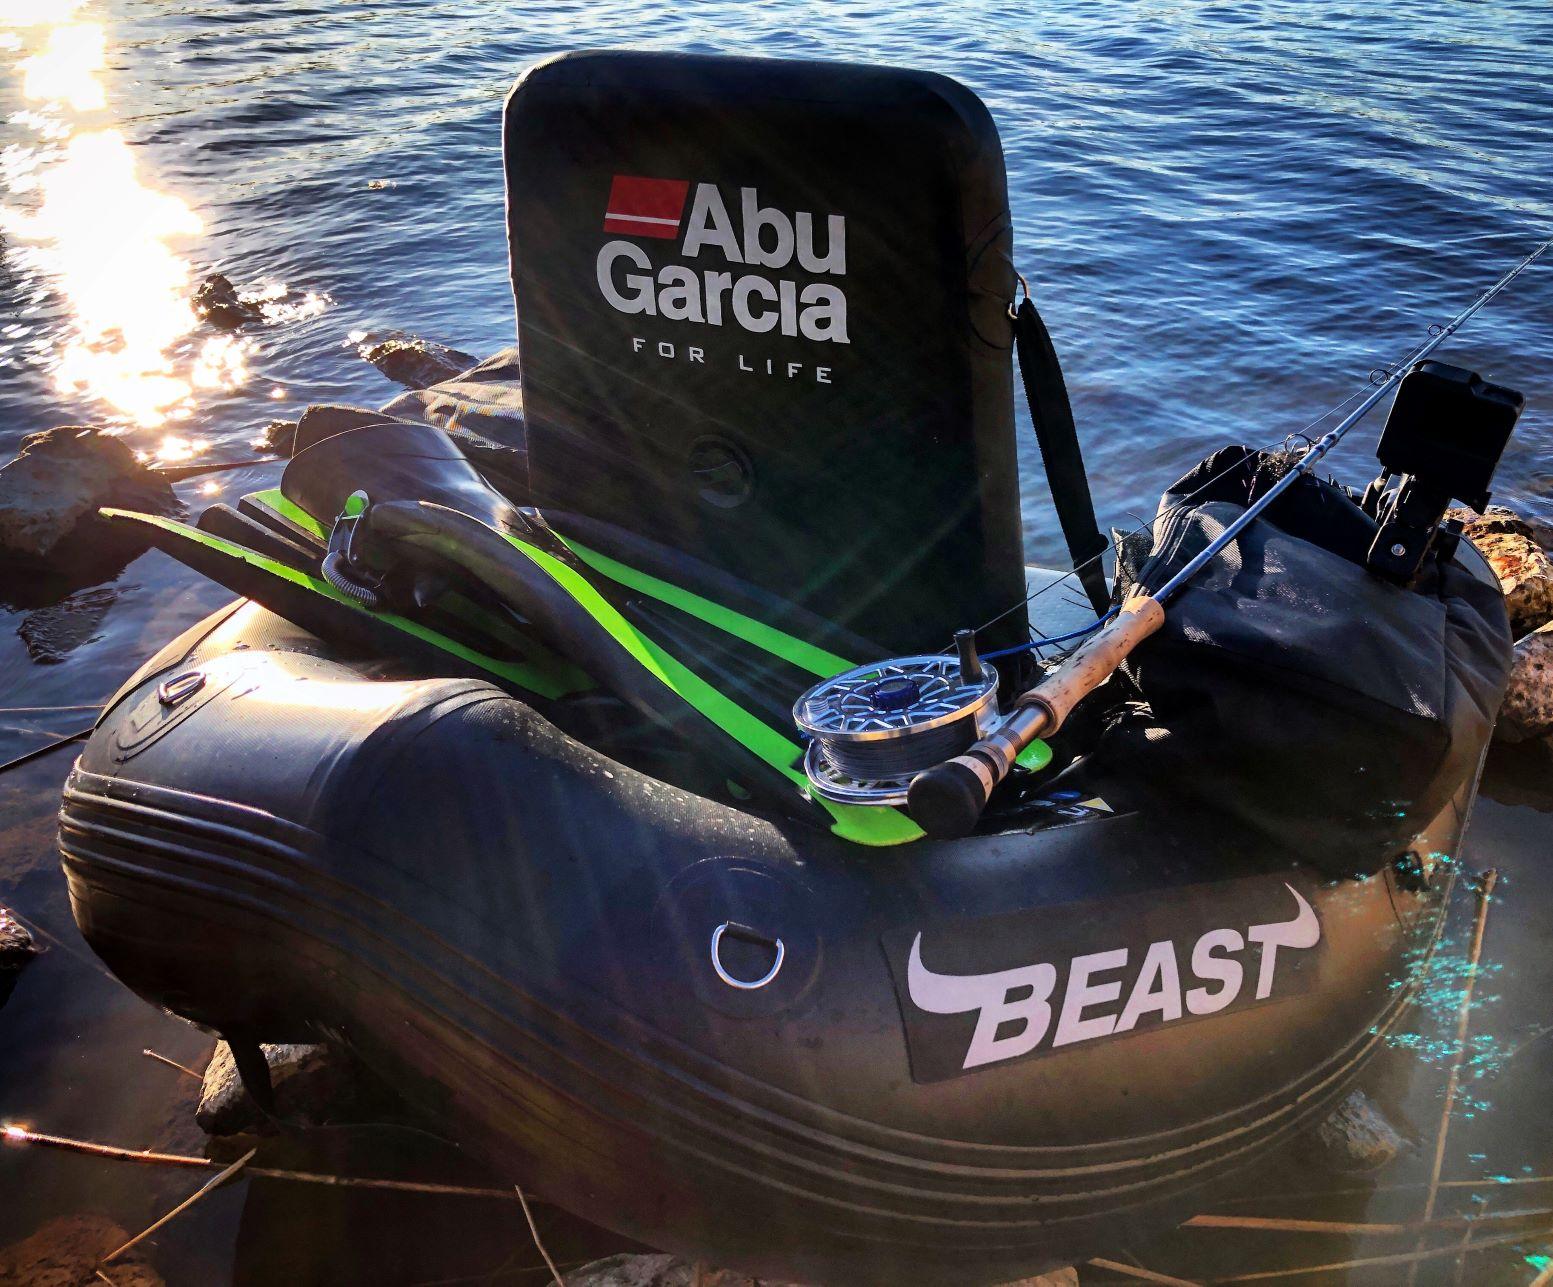 AB Christian Drost - Esoxonly-abugarcia-beastbellyboat-fullframe.jpg